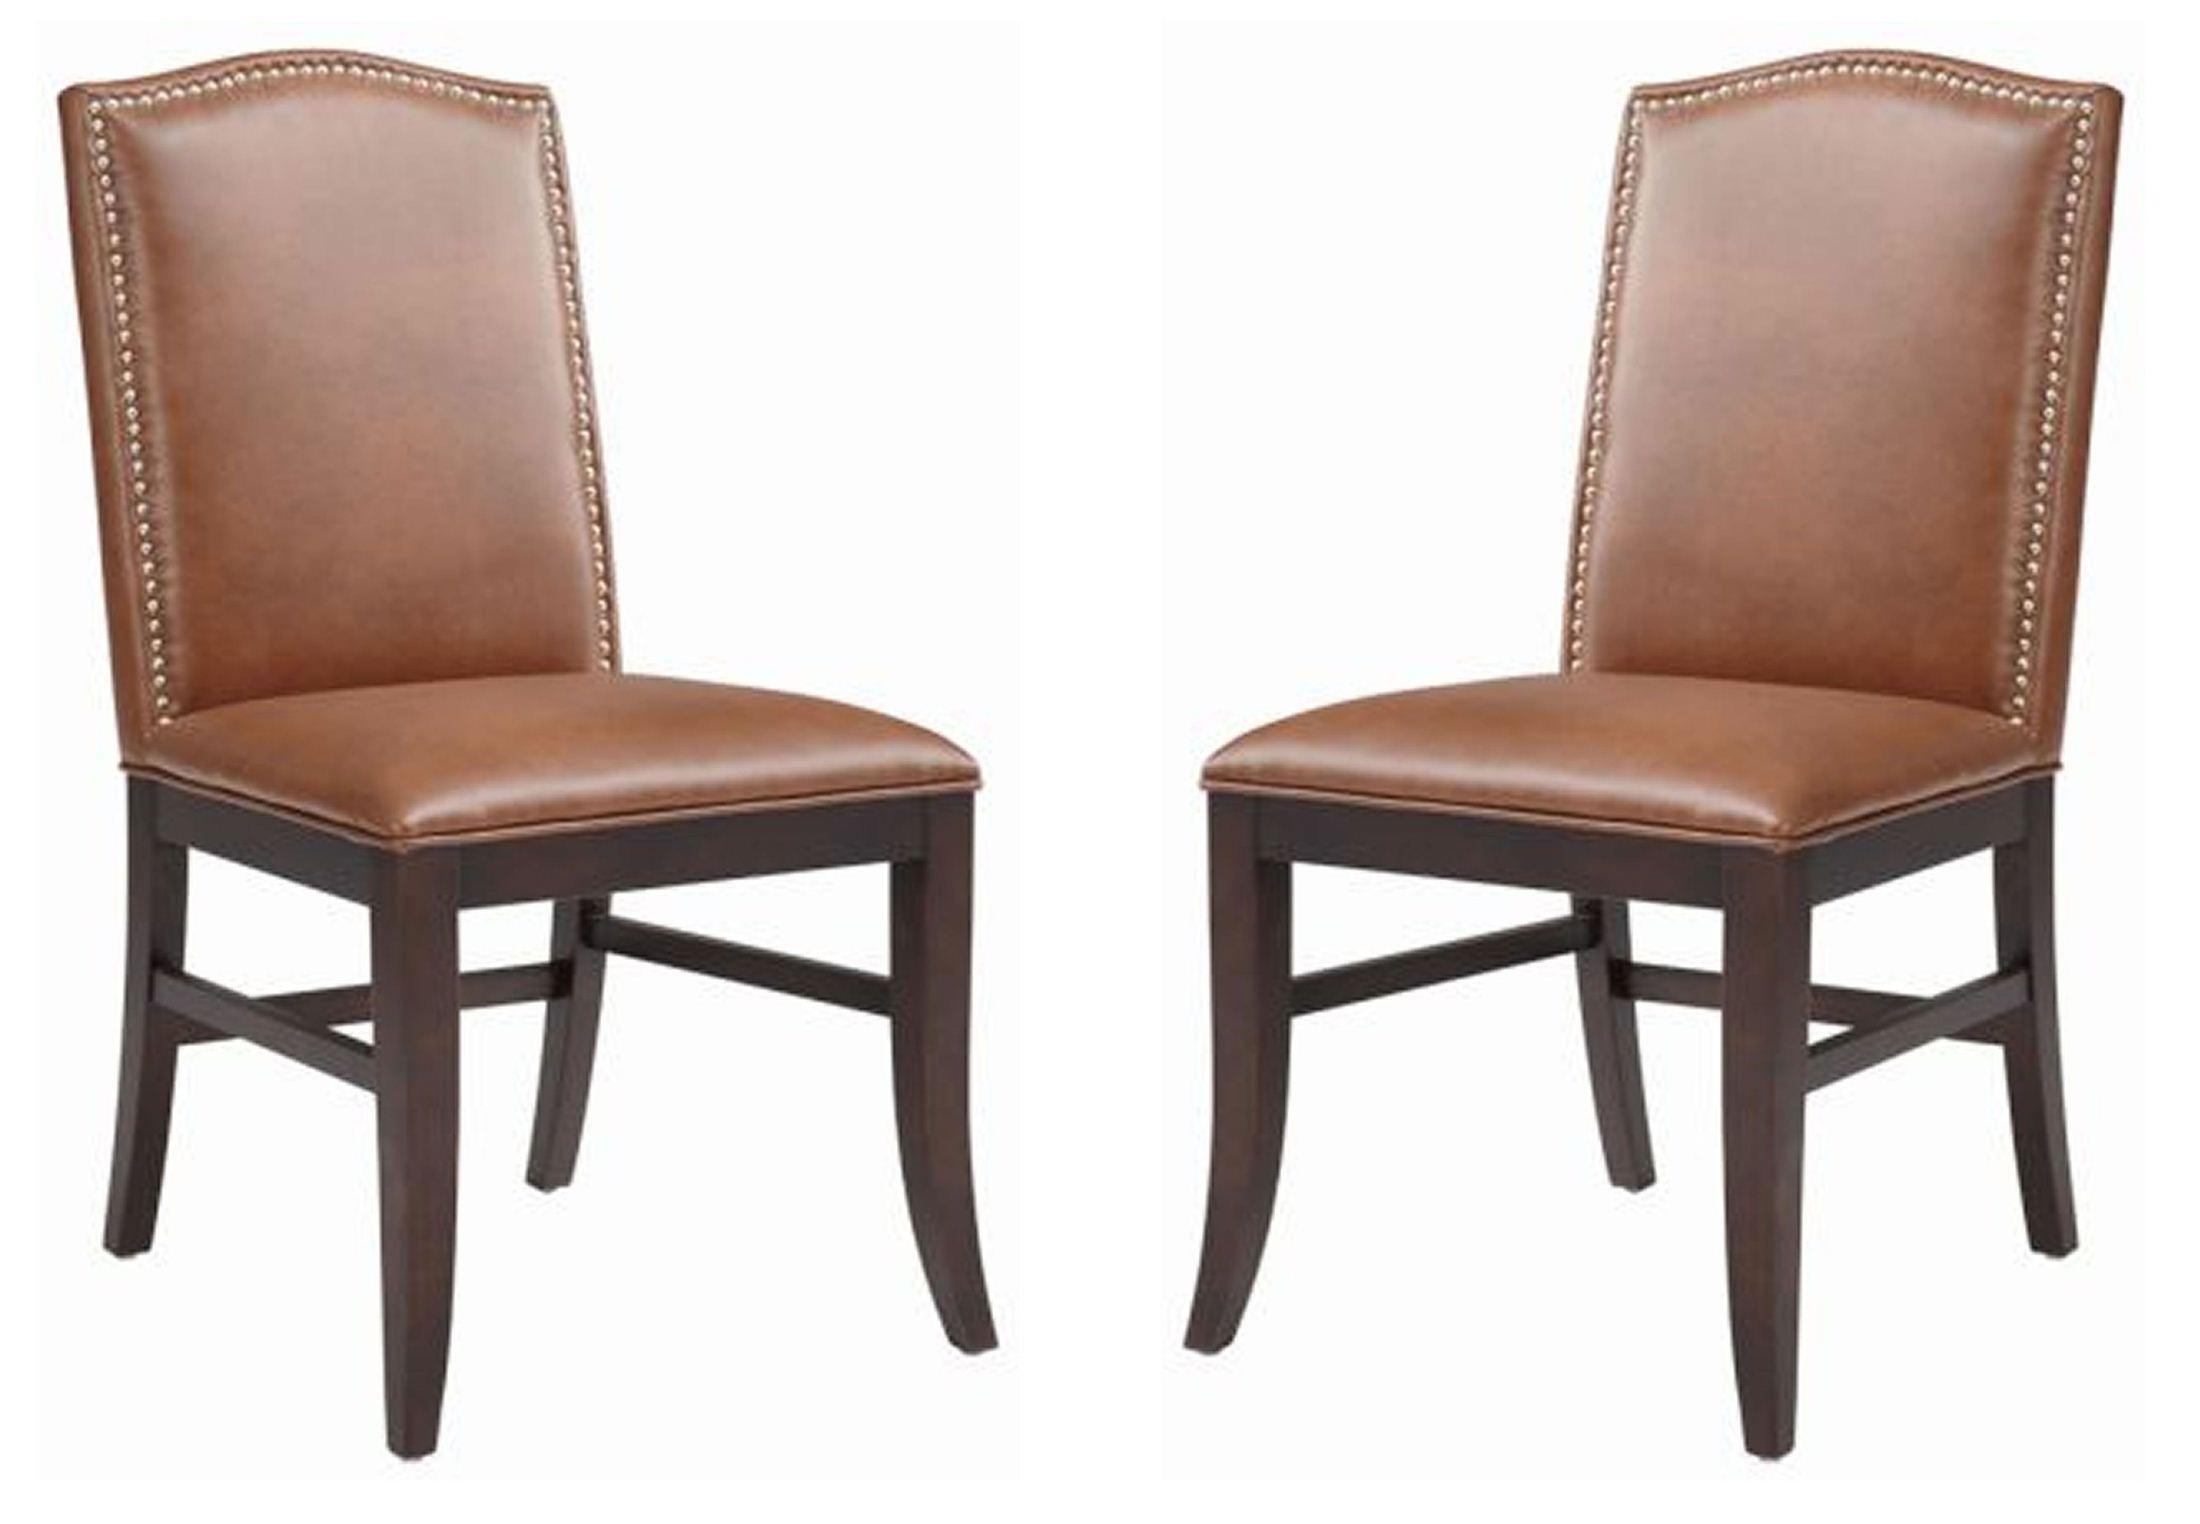 Maison cognac leather dining chair set of 2 from sunpan 28609 coleman furniture - Maison moderne diningchair ...